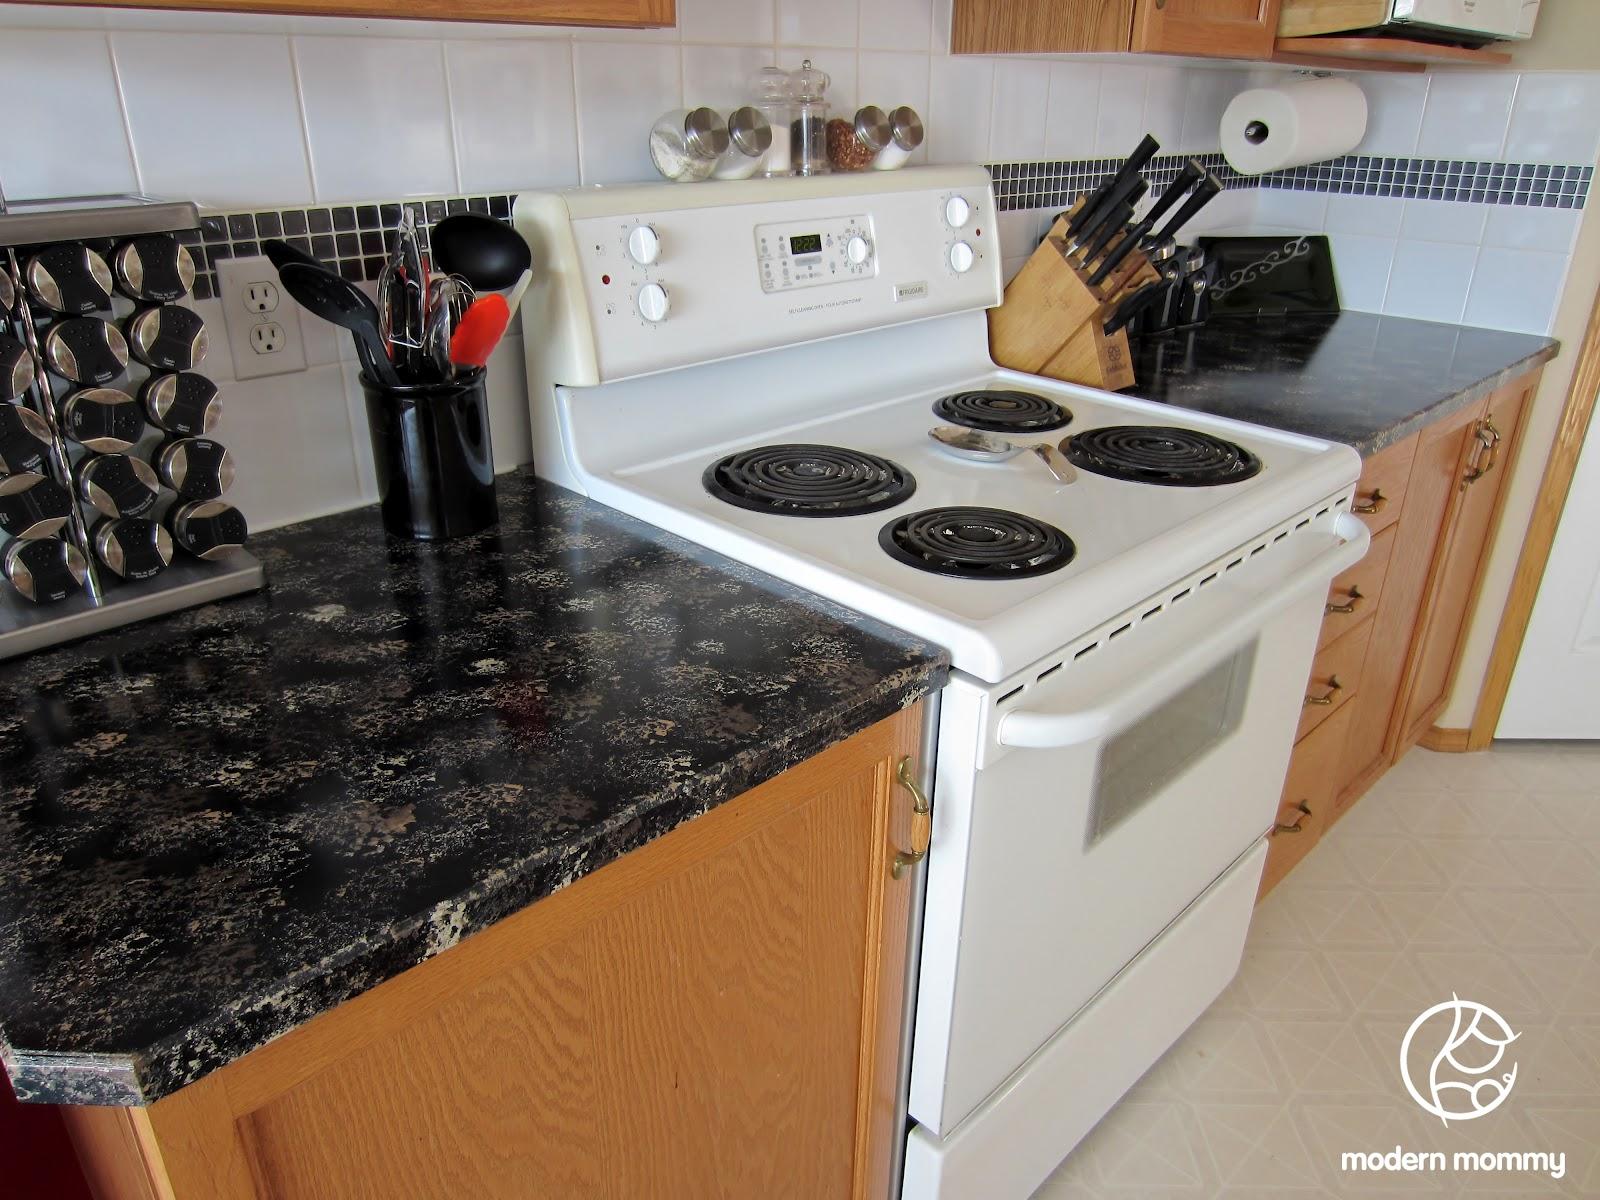 Modern Mommy Home Diy Part 2 Granite Countertop Paint In